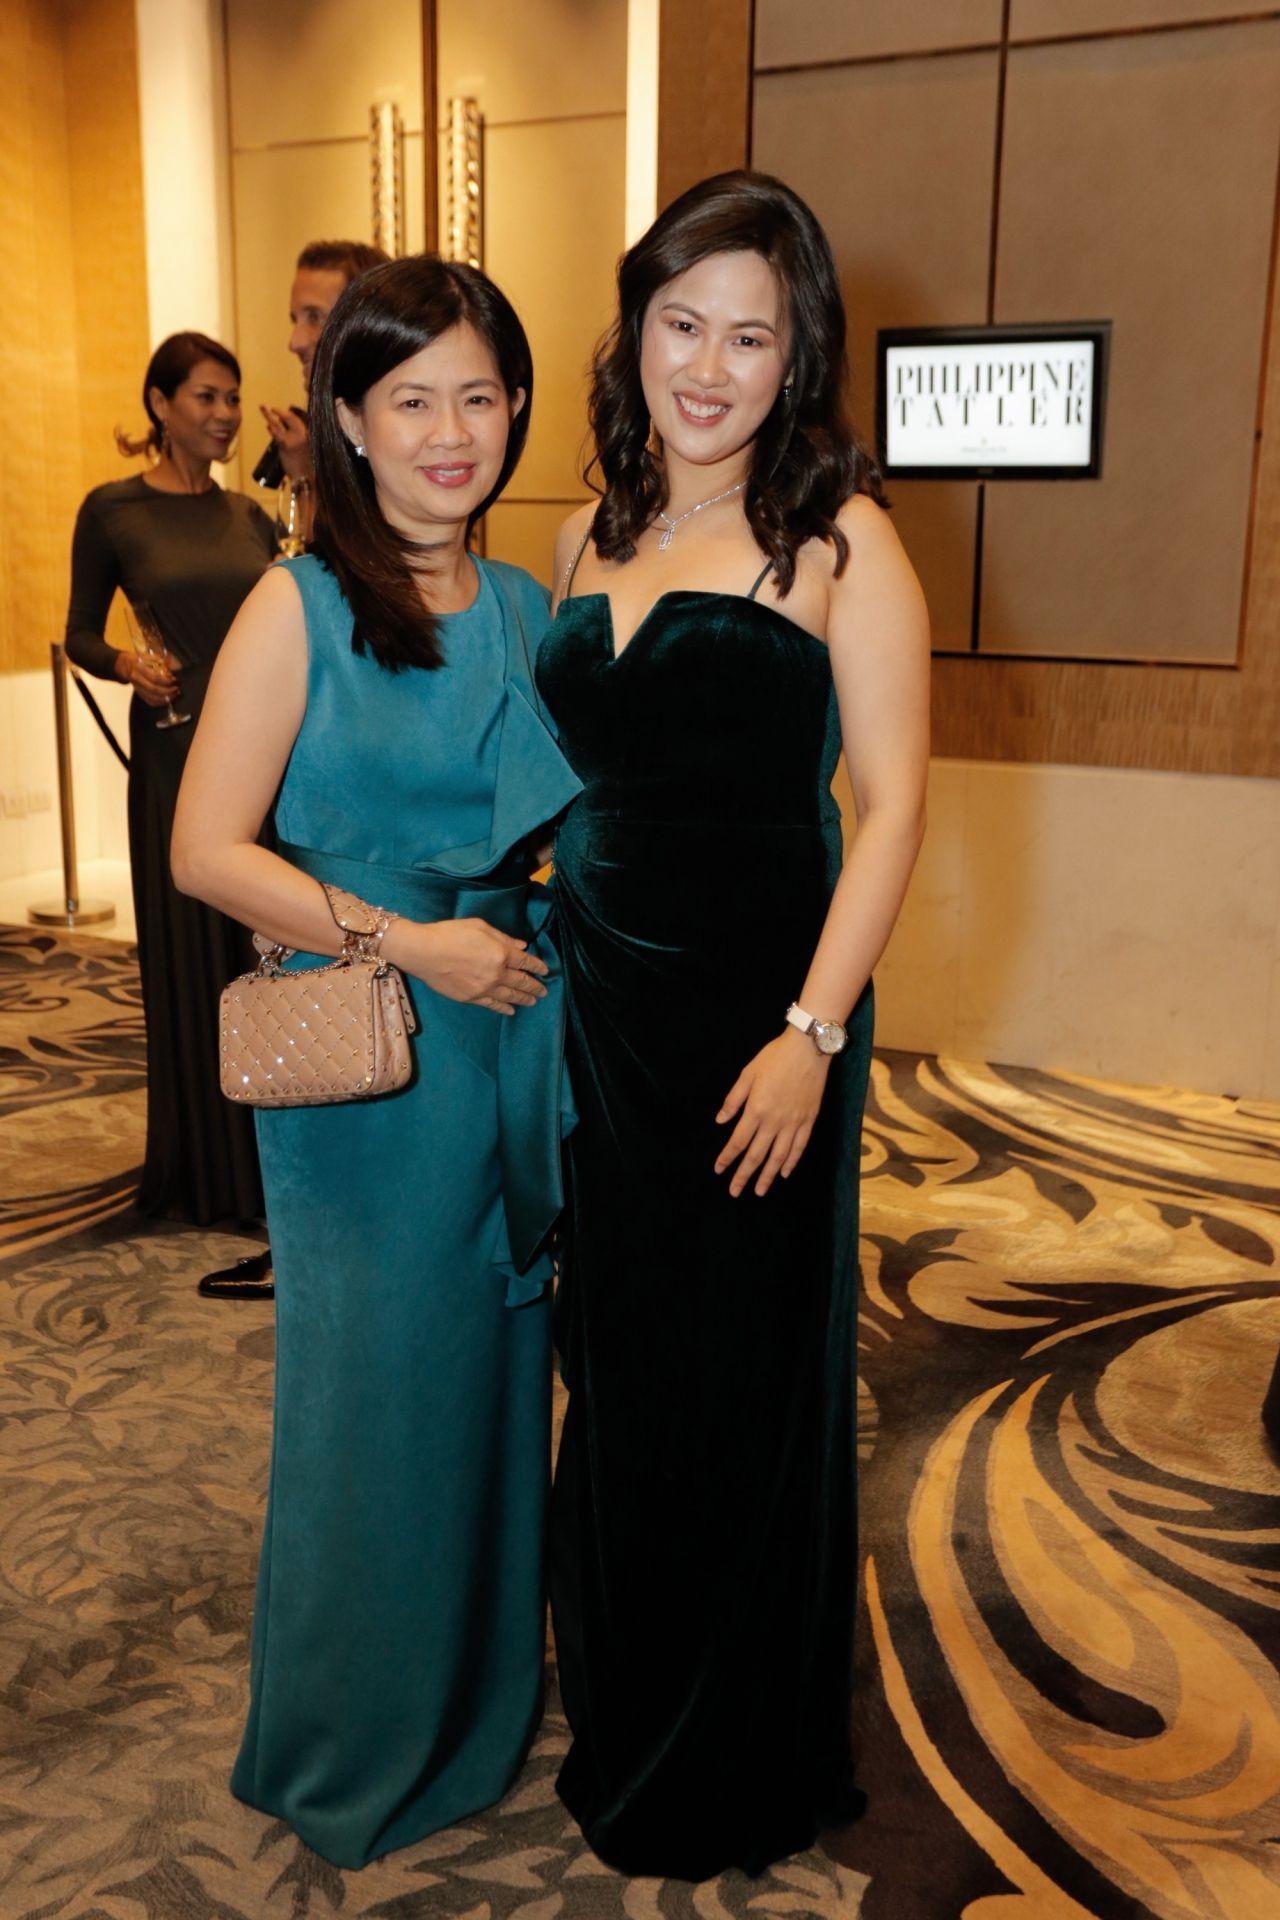 Ling Ling and May Yao